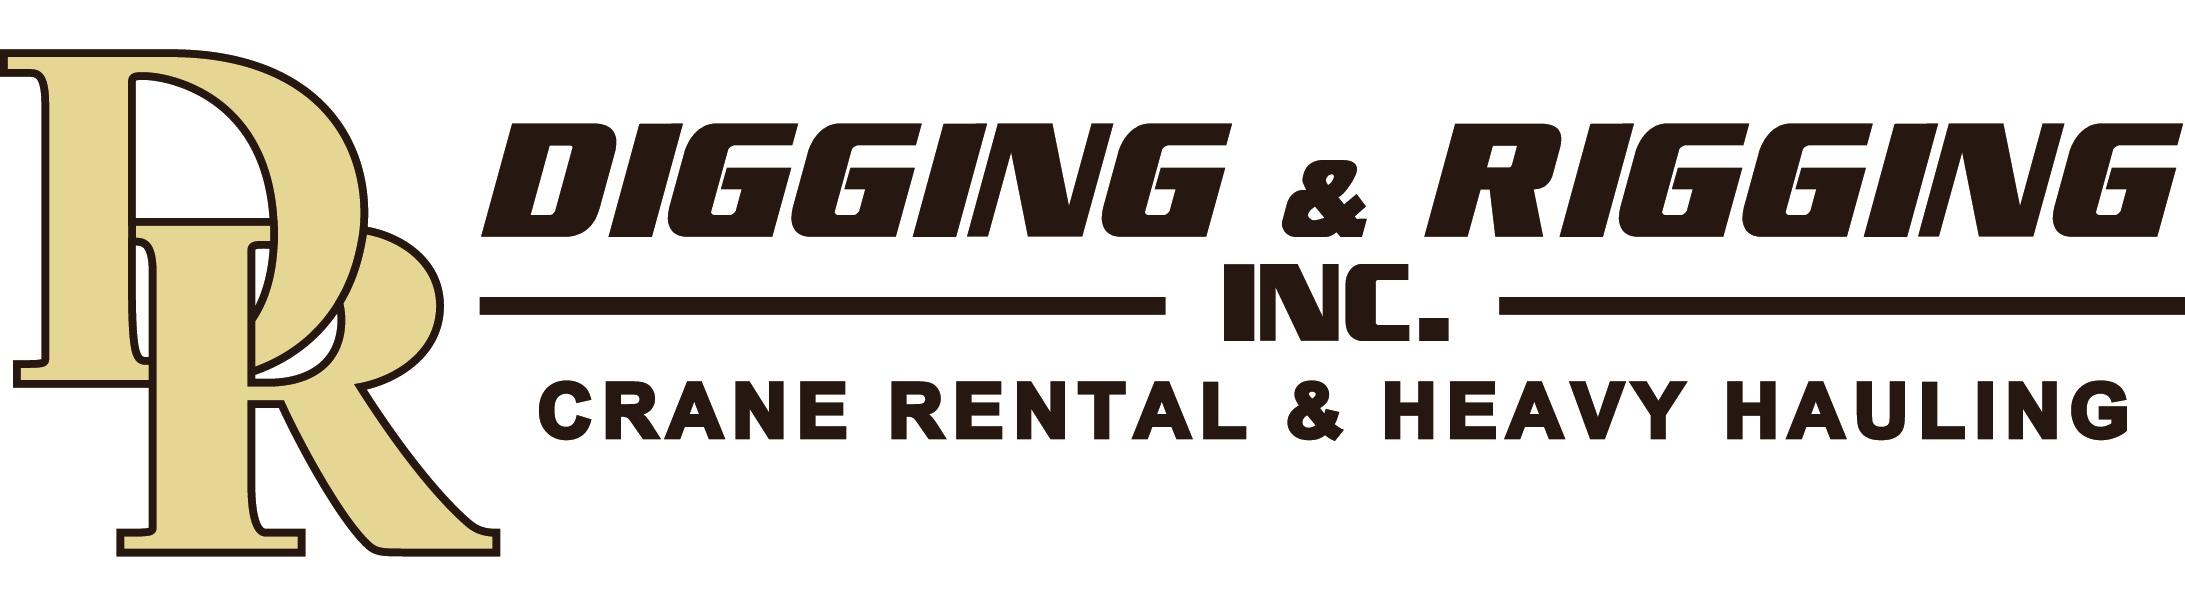 Digging & Rigging, Inc. Logo